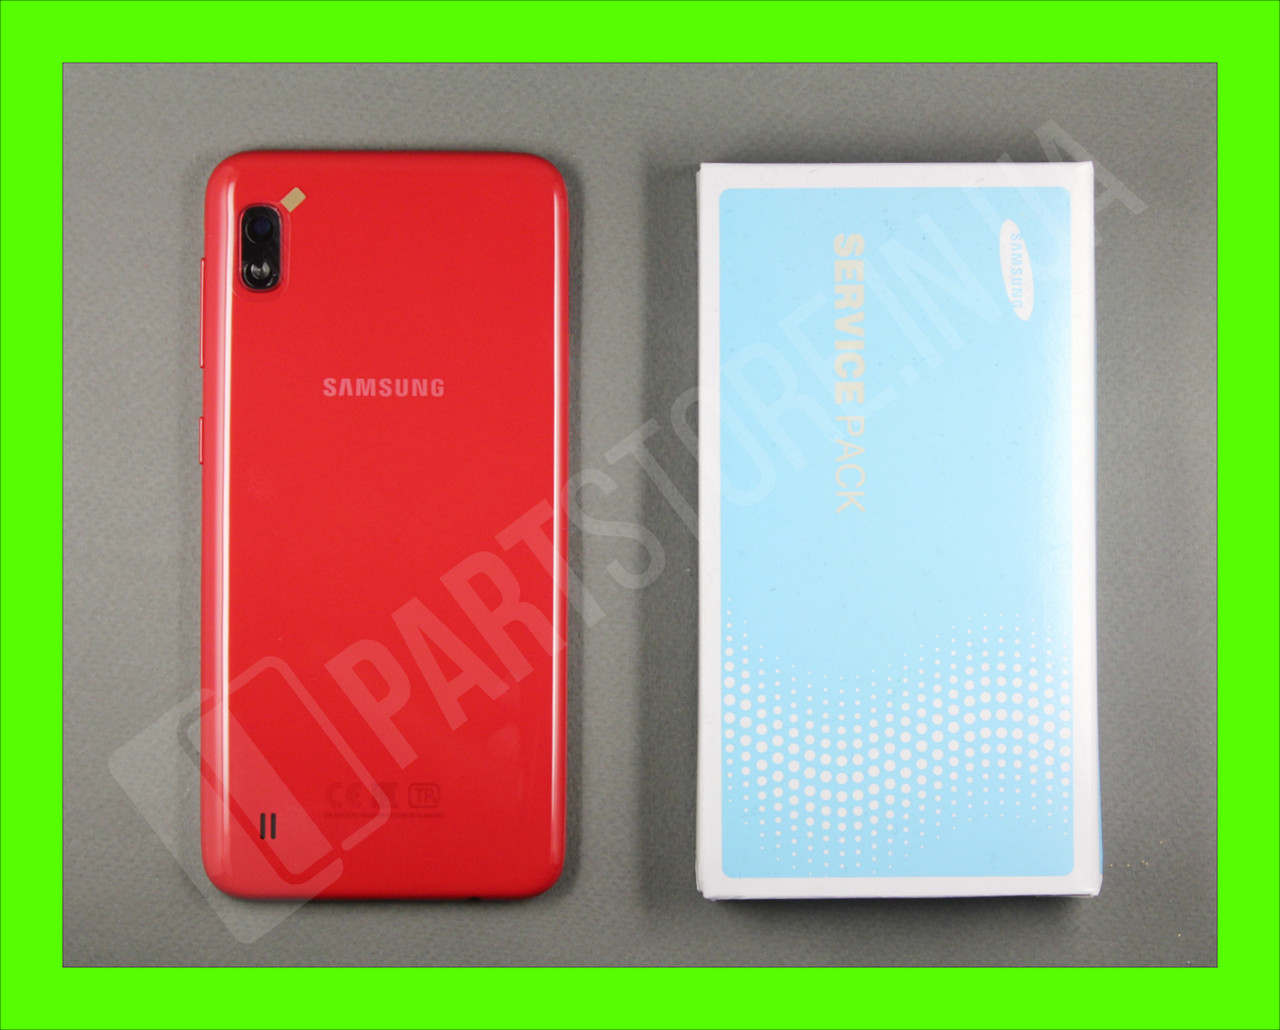 Cервисная оригинальная задняя Крышка Samsung A105 Red  A10 2019 (GH82-19506D)